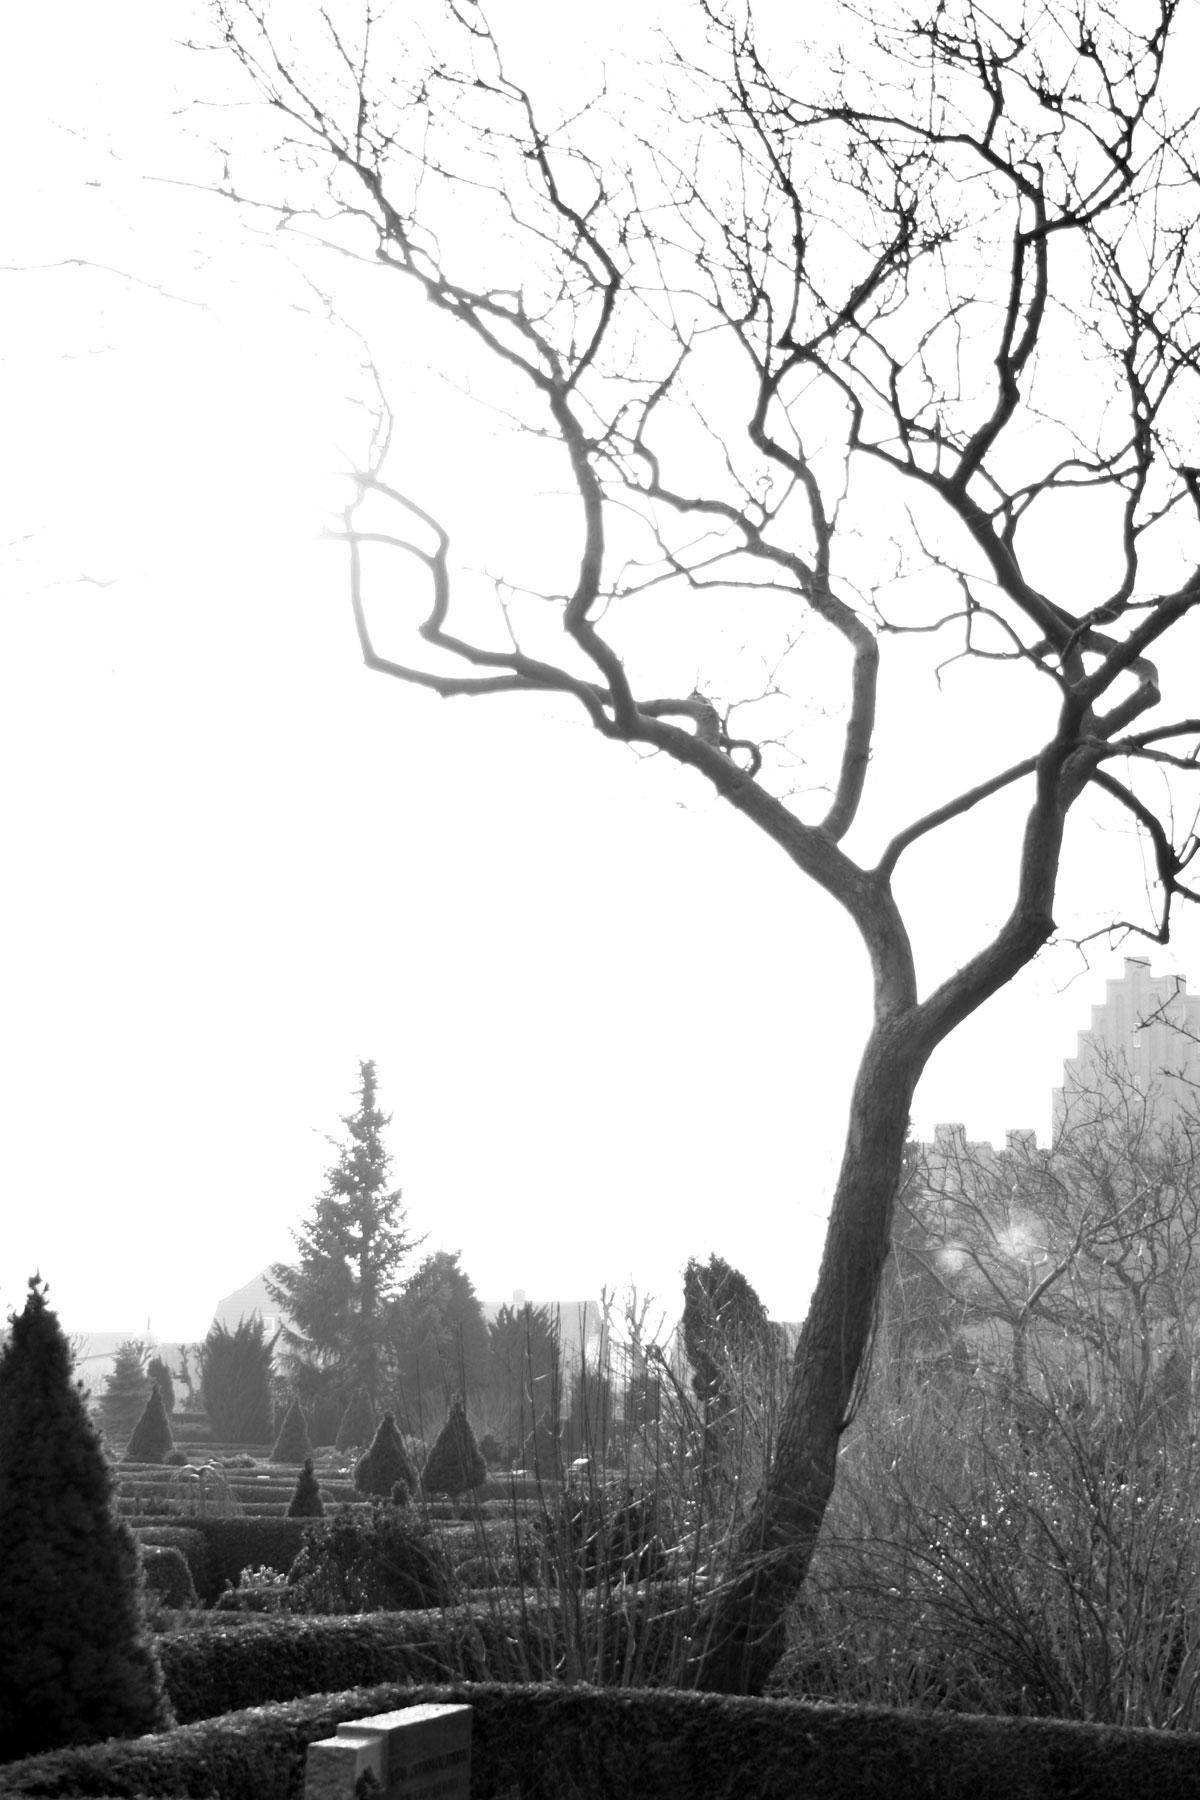 Tree in cemetary, Black, Cemetary, Church, Dead, HQ Photo